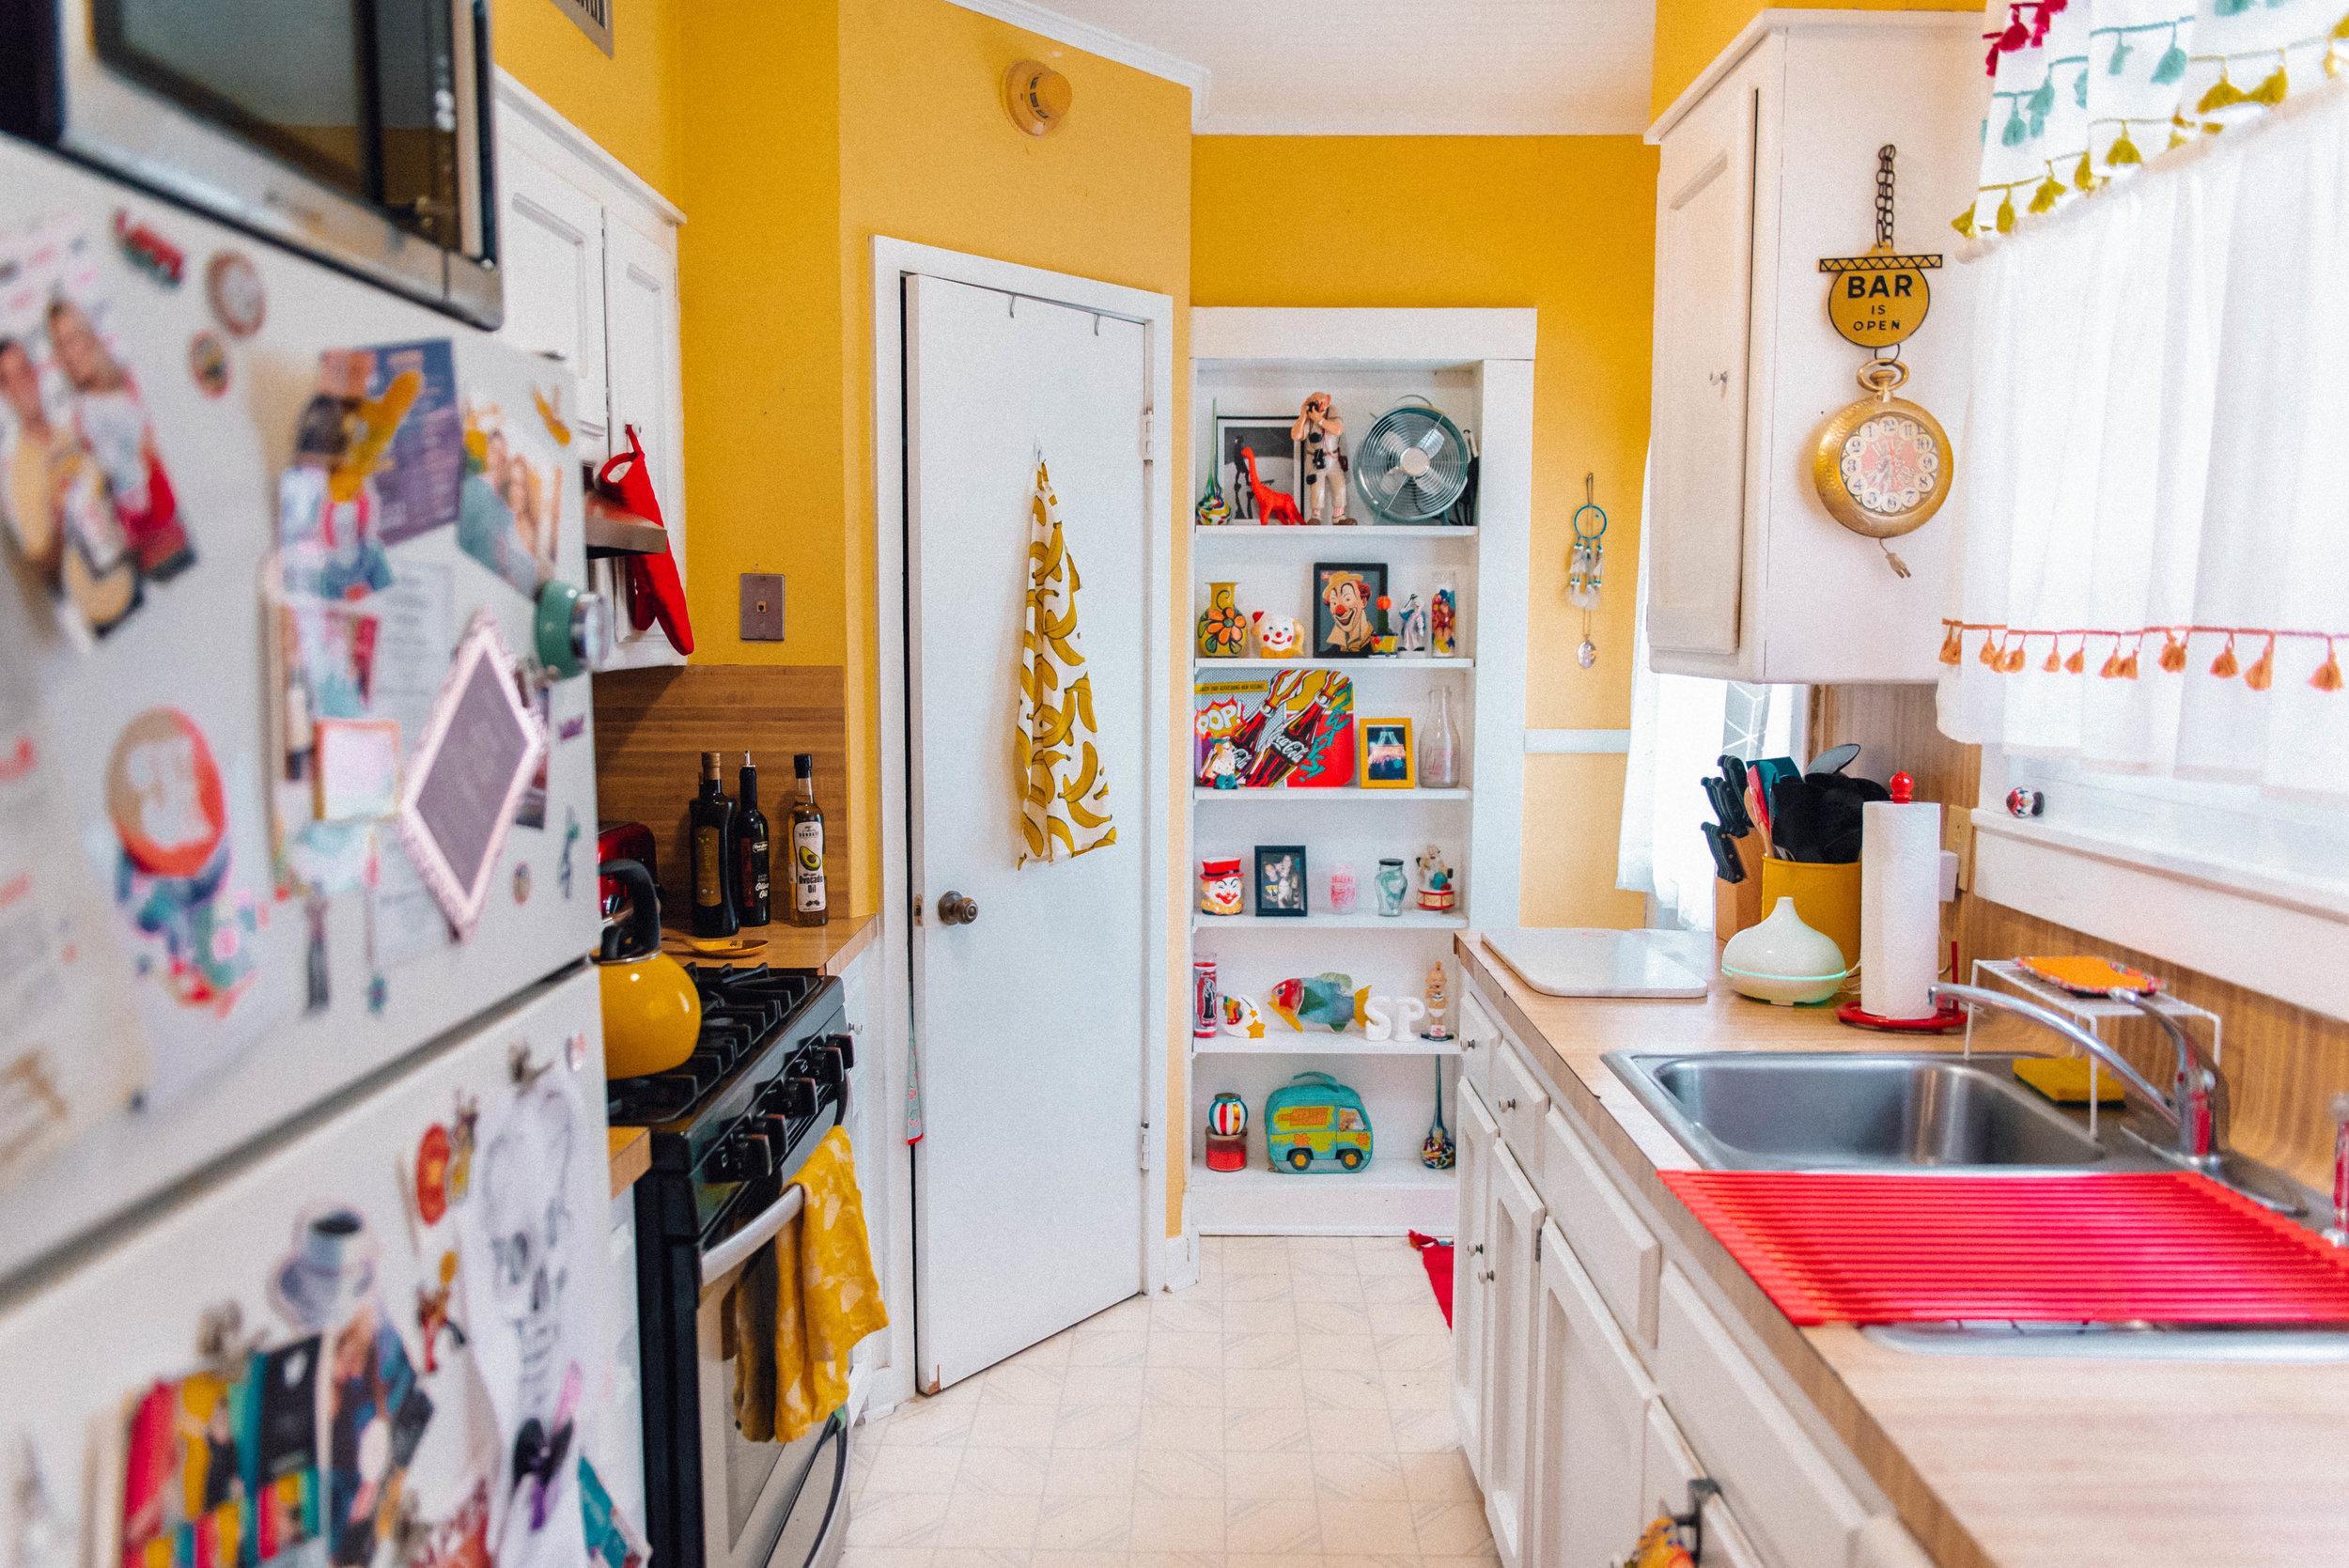 My Chromatic Home | Garden District Apartment Tour with Jordan Hefler in Baton Rouge, Louisiana